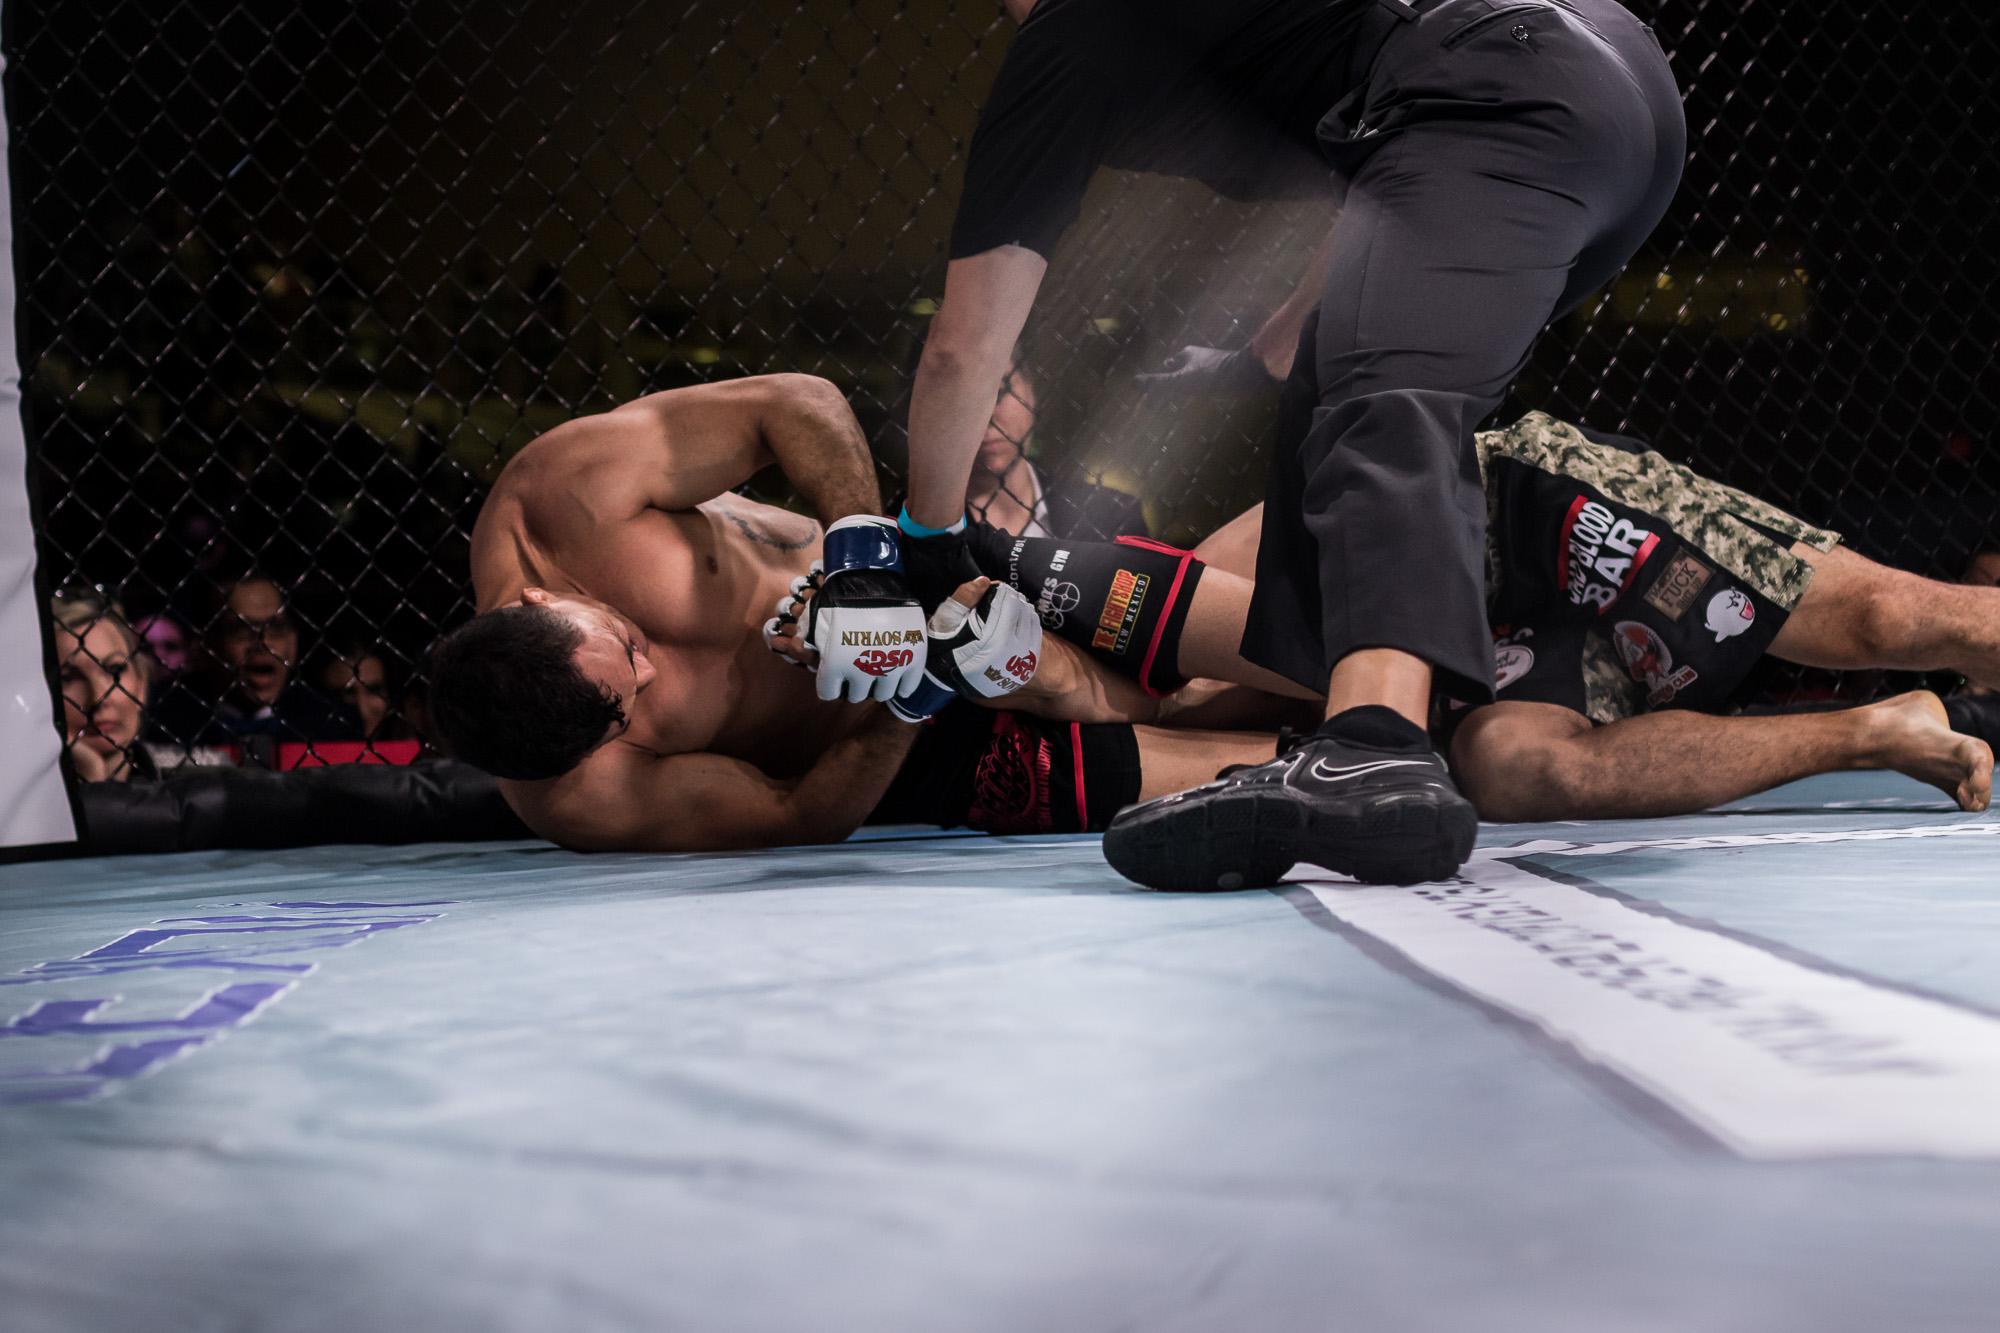 Fight #9 - Jesse Gross vs. Armando Gomes